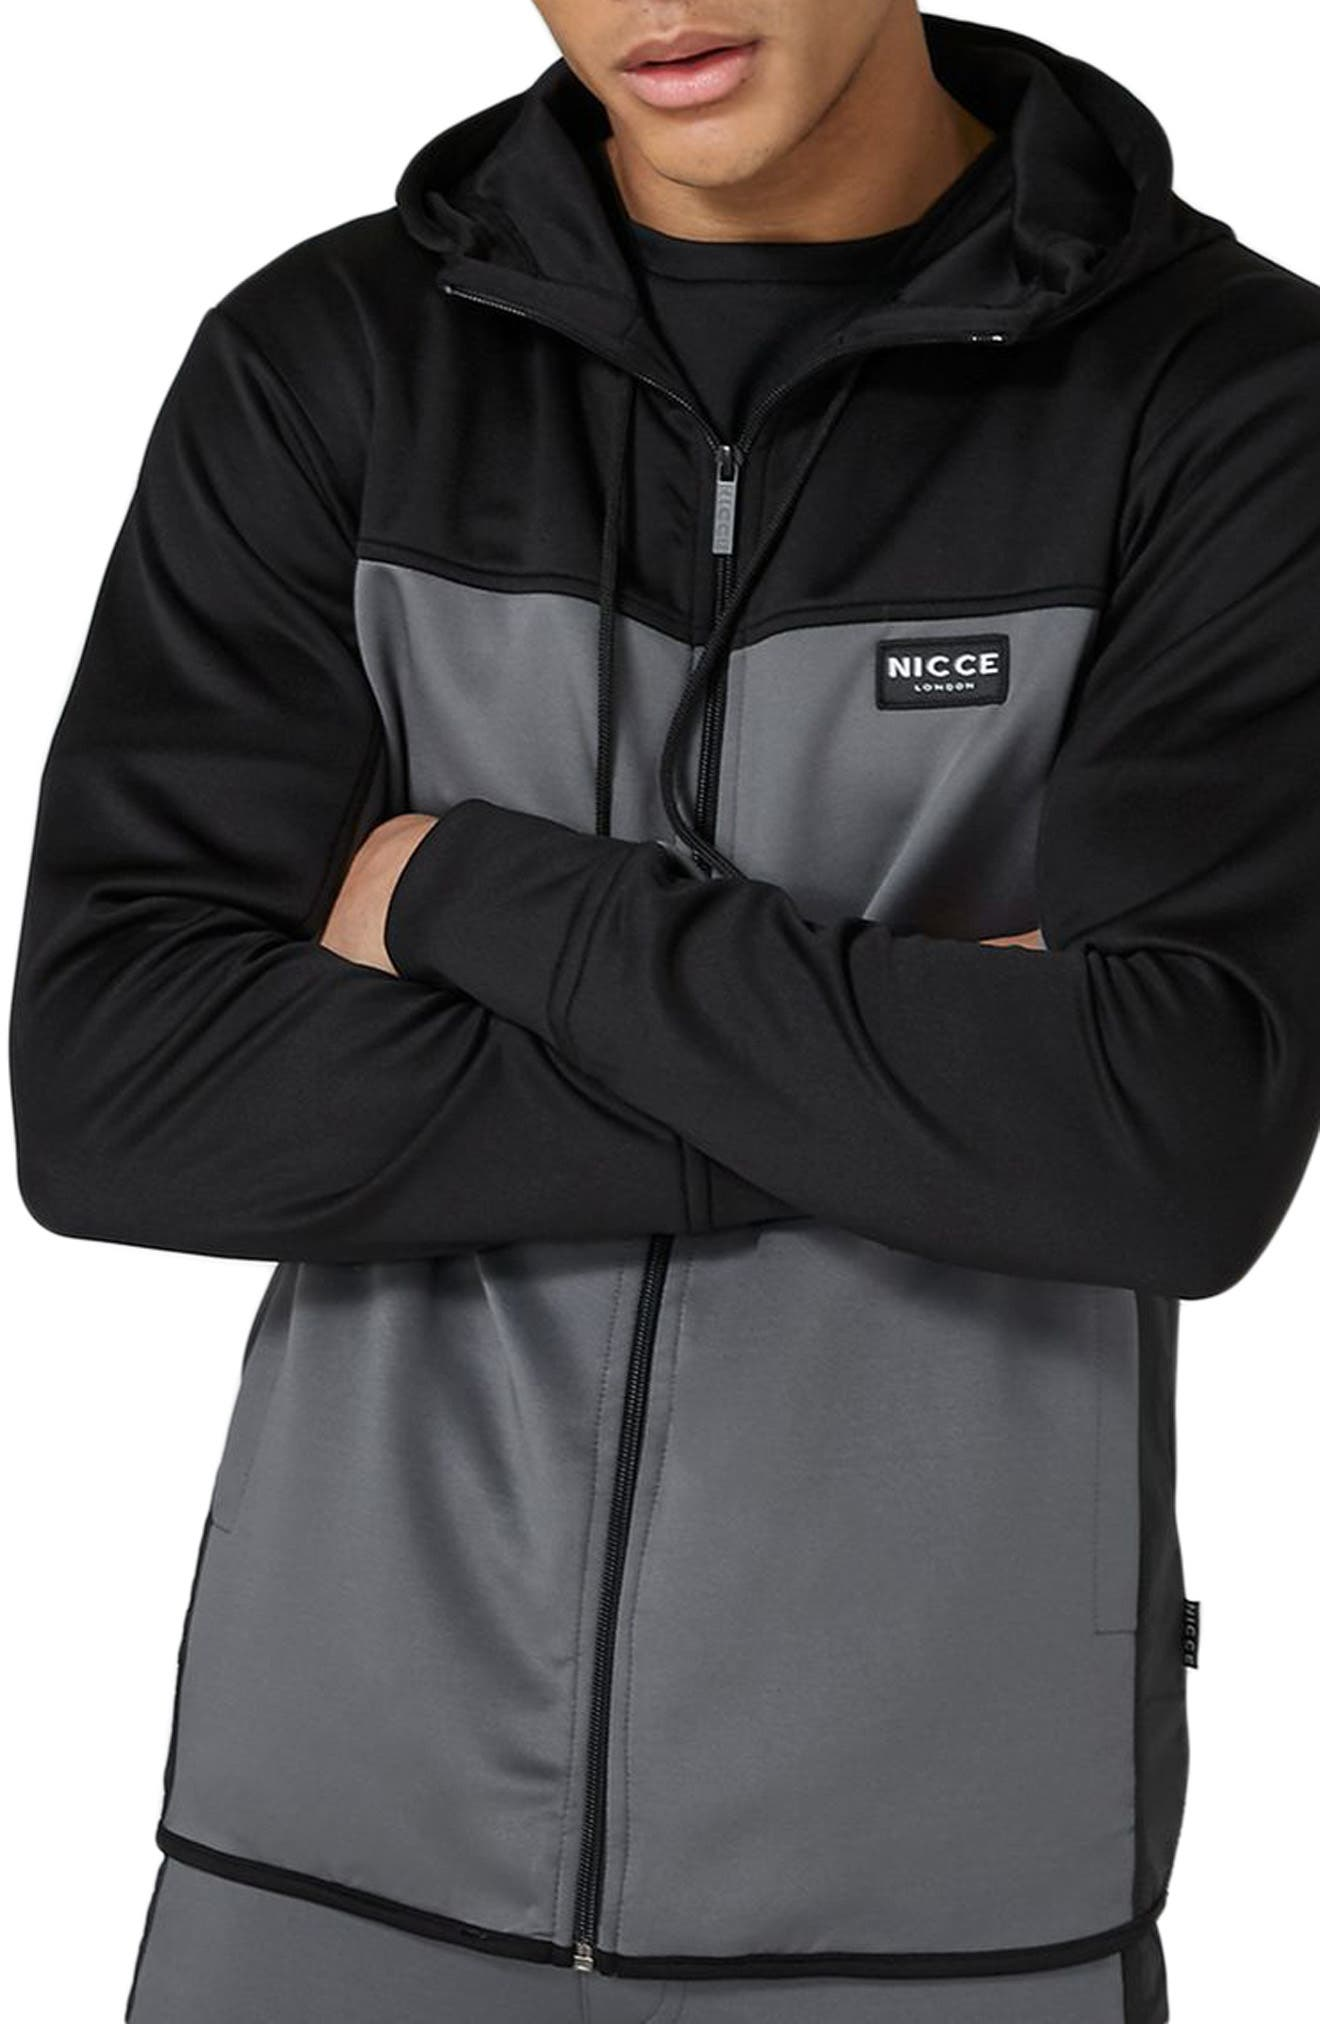 Topshop NICCE Hybrid Track Jacket,                         Main,                         color, BLACK MULTI